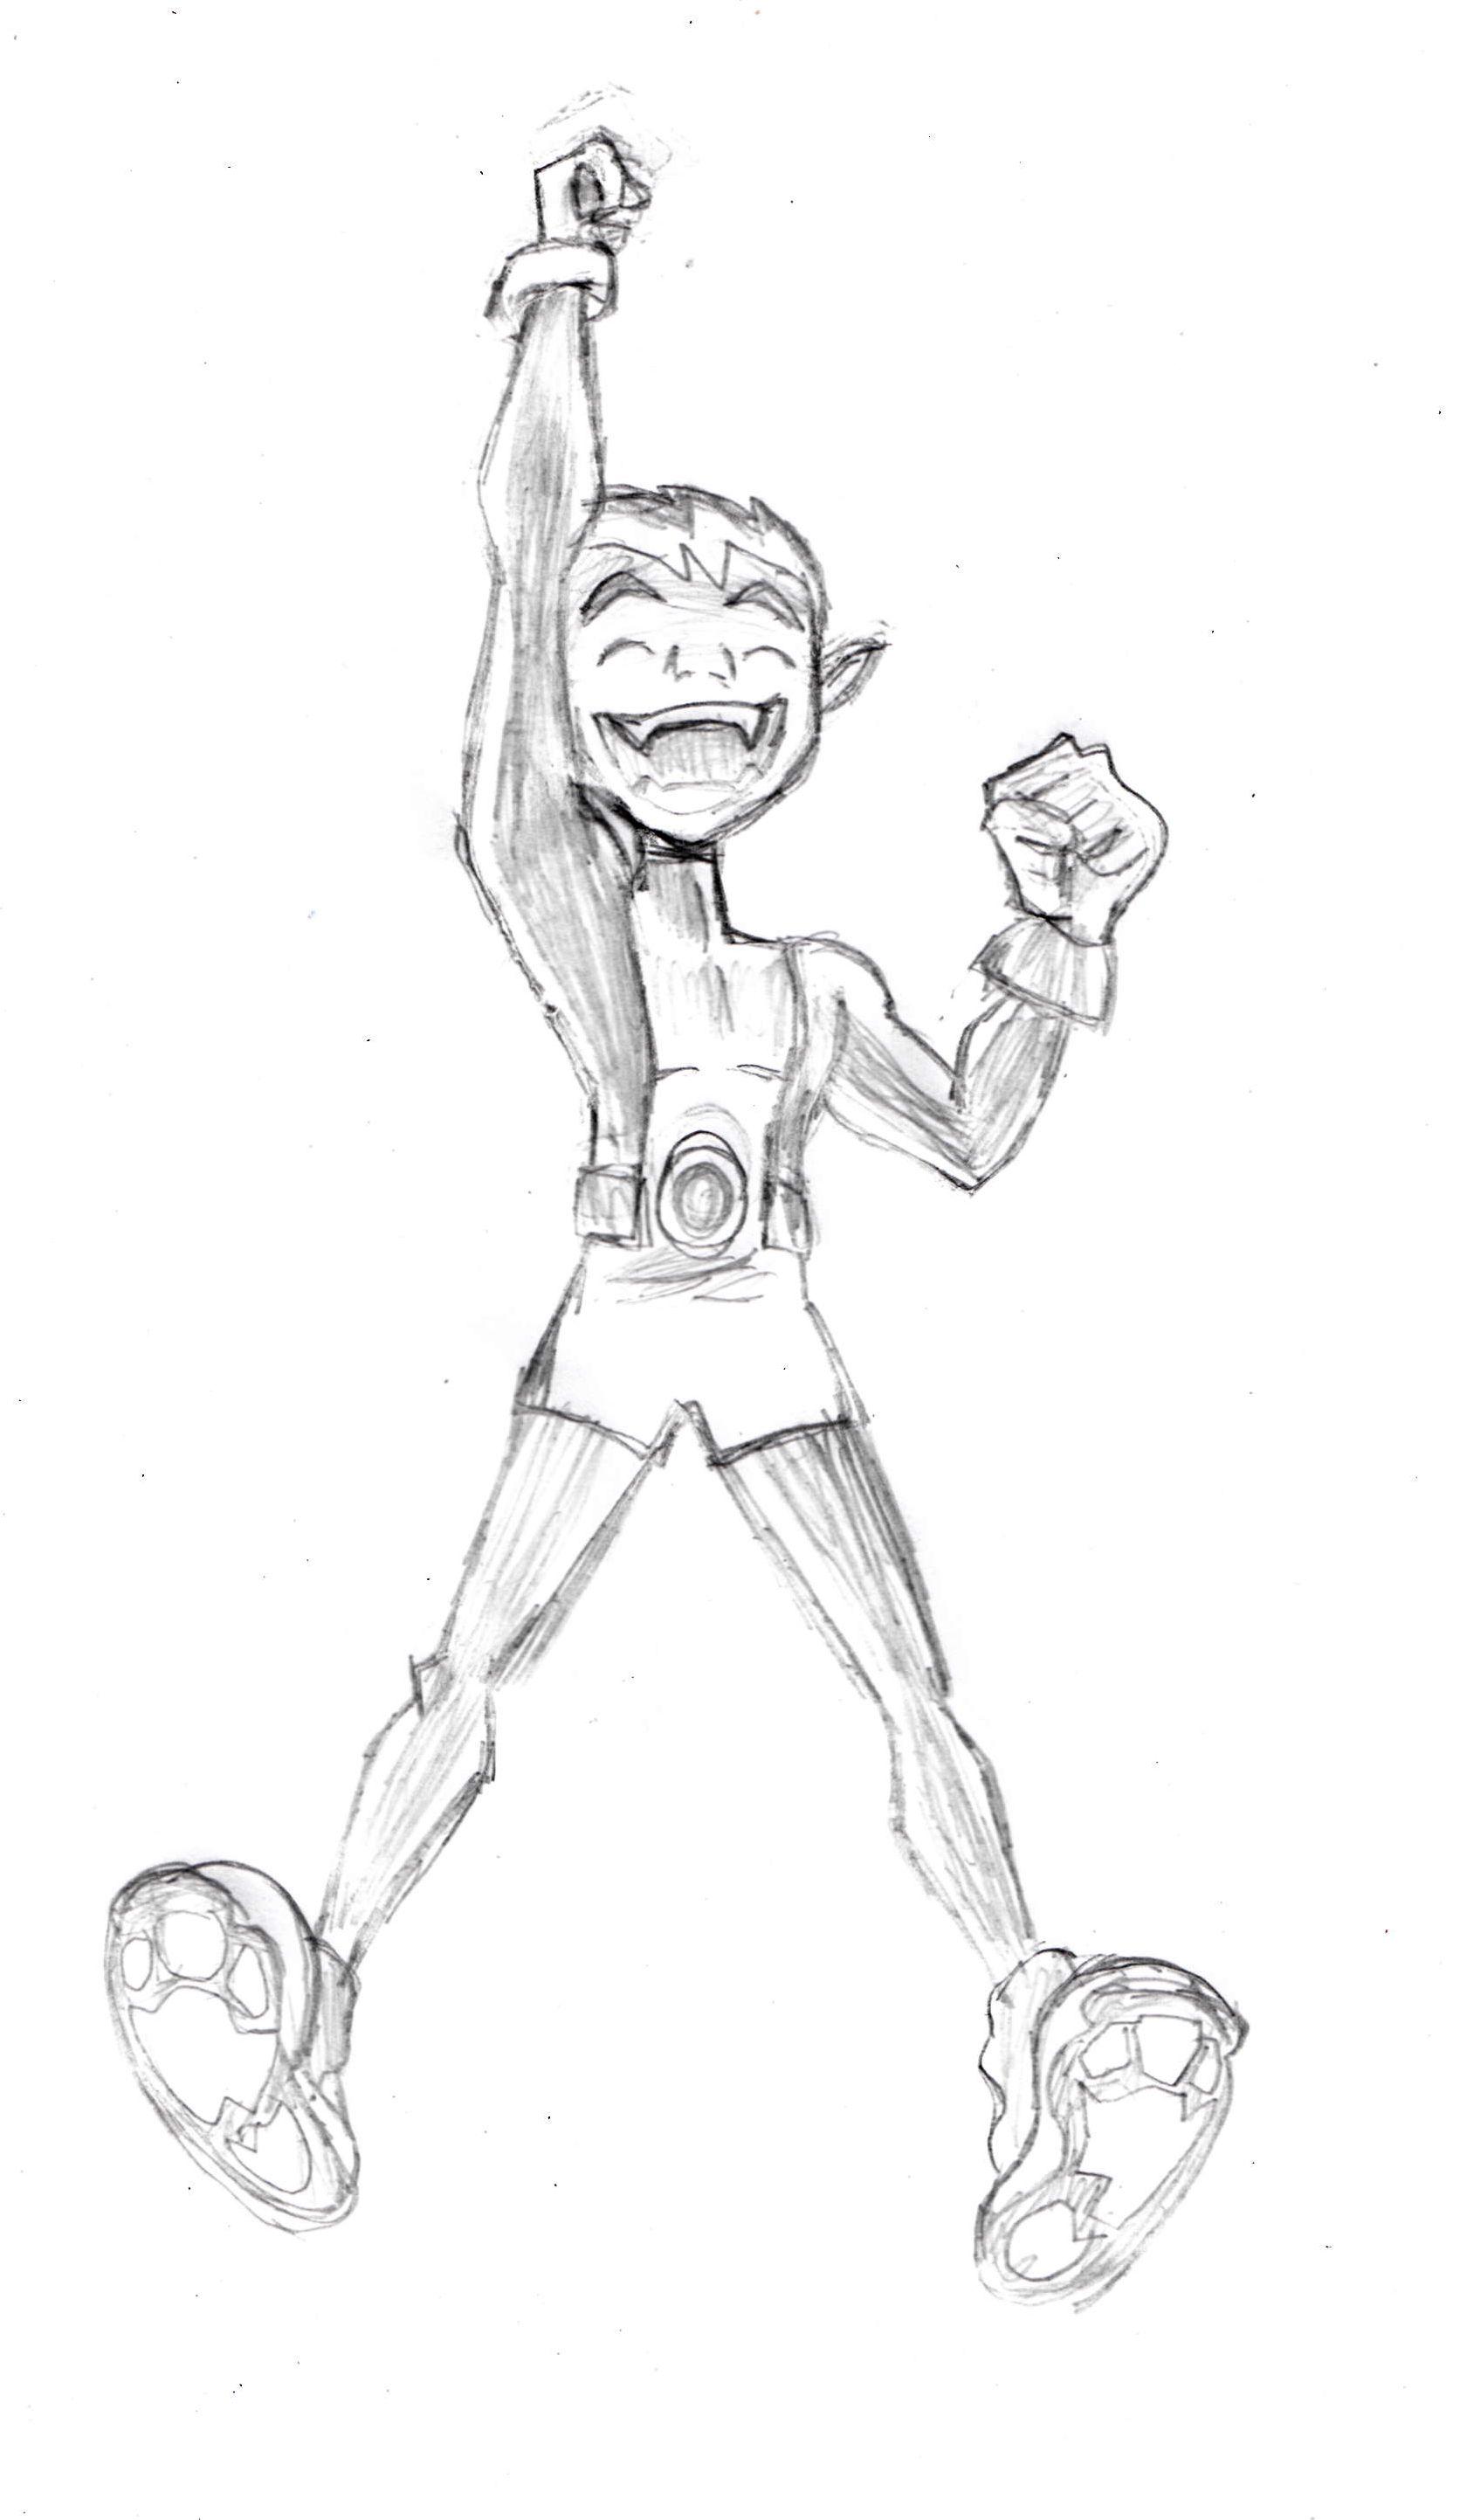 Beast Boy sketch http://drawingmanuals.com/manual/how-to